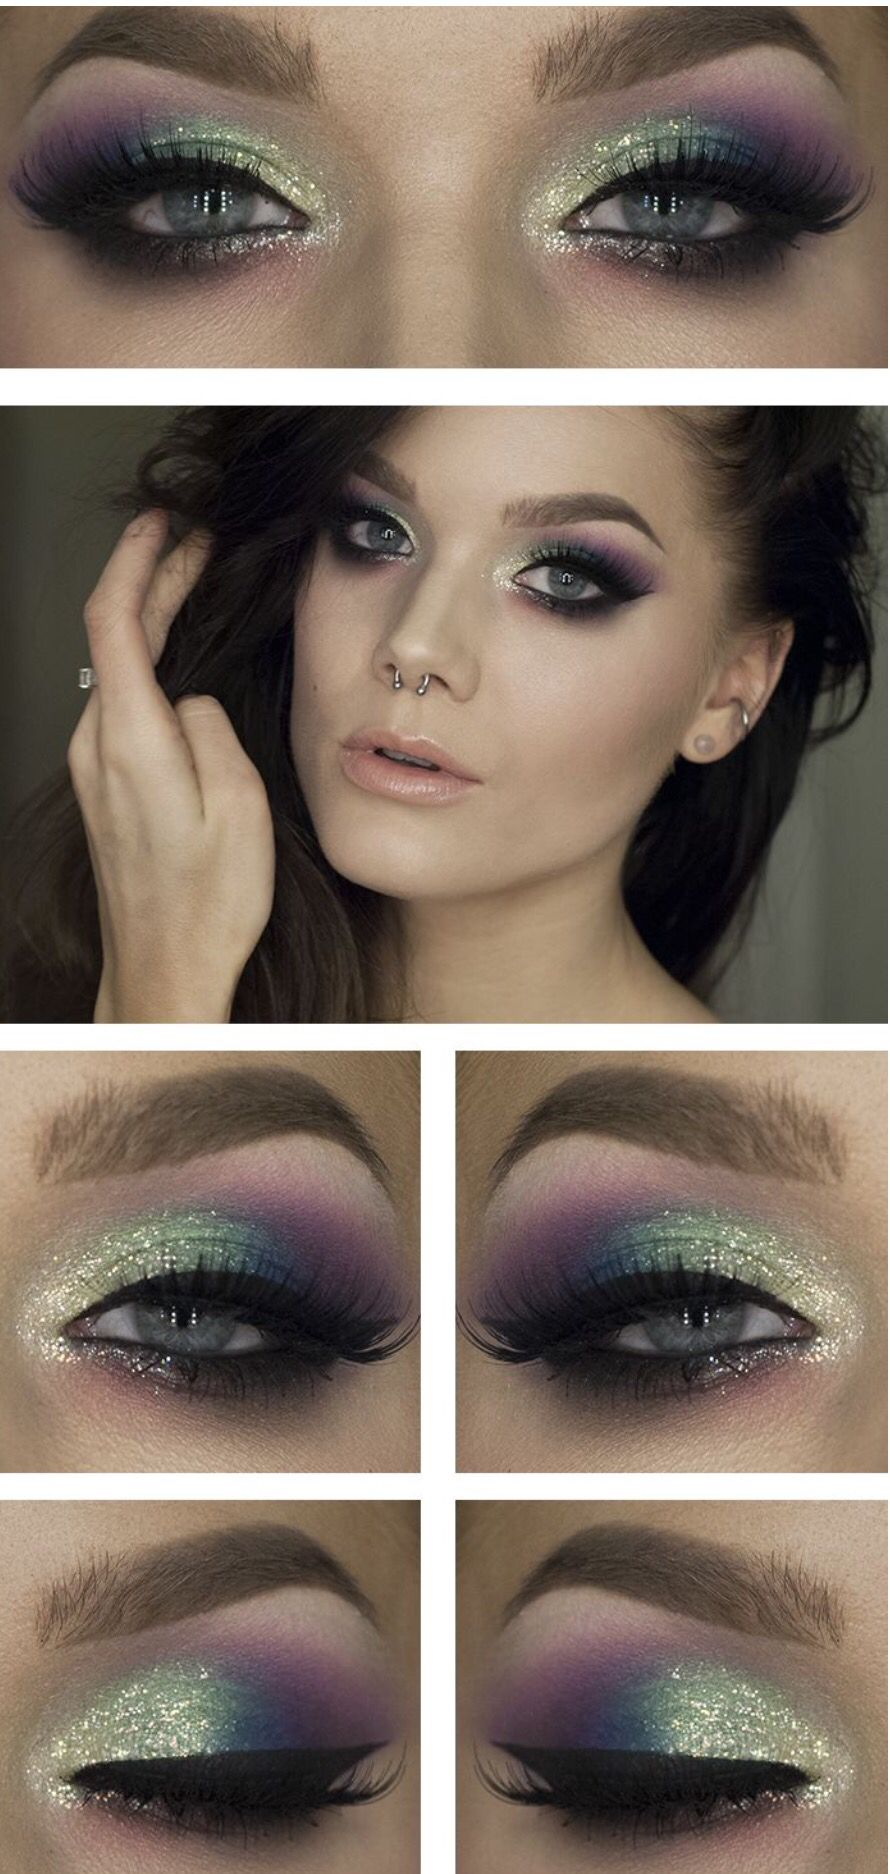 Makeup, make-up, or make up?